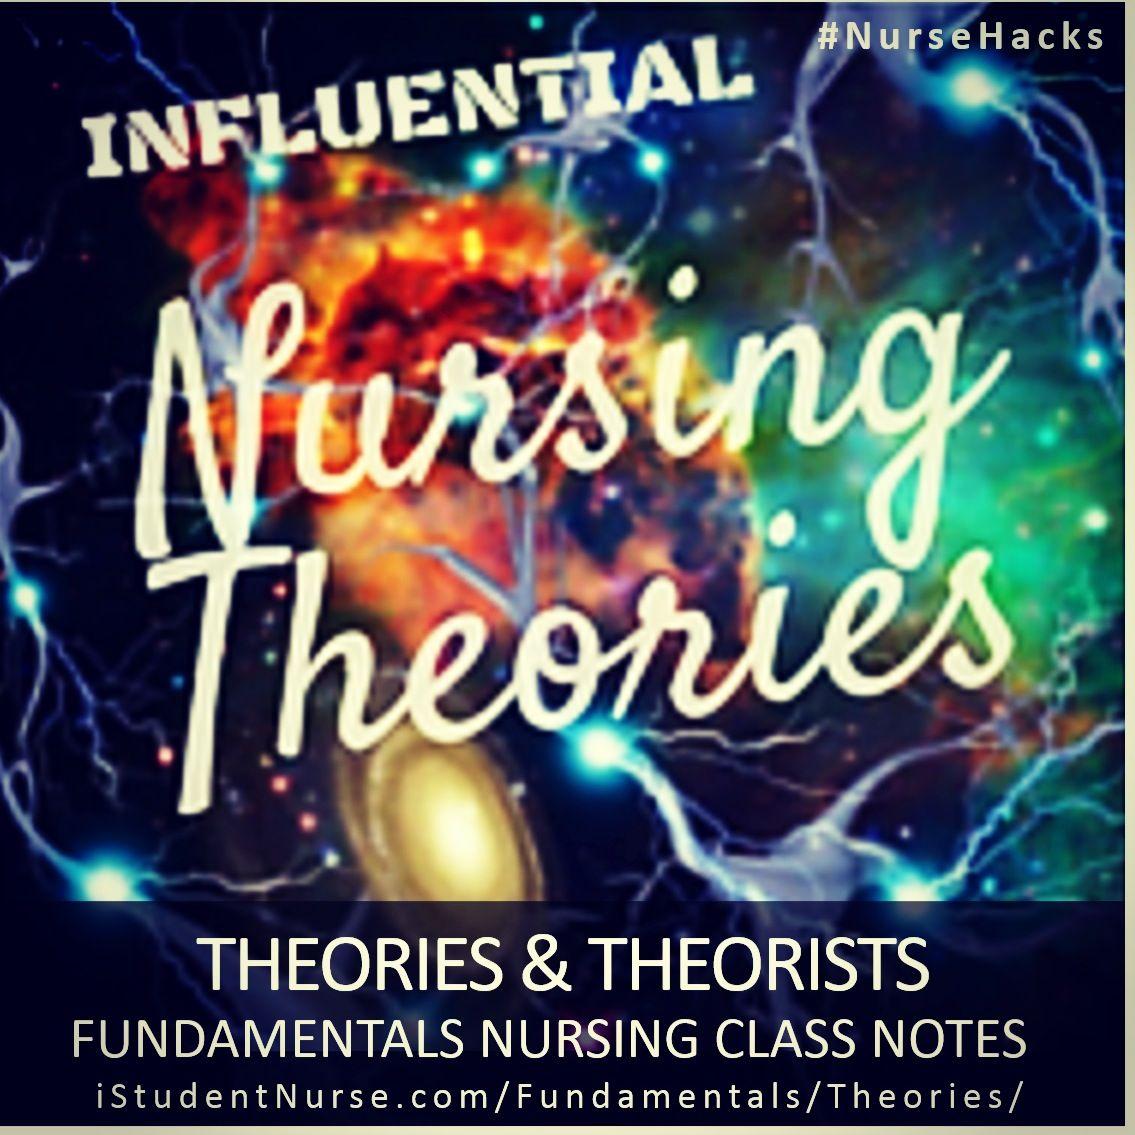 Theories & Theorists that Influence Nursing Practice